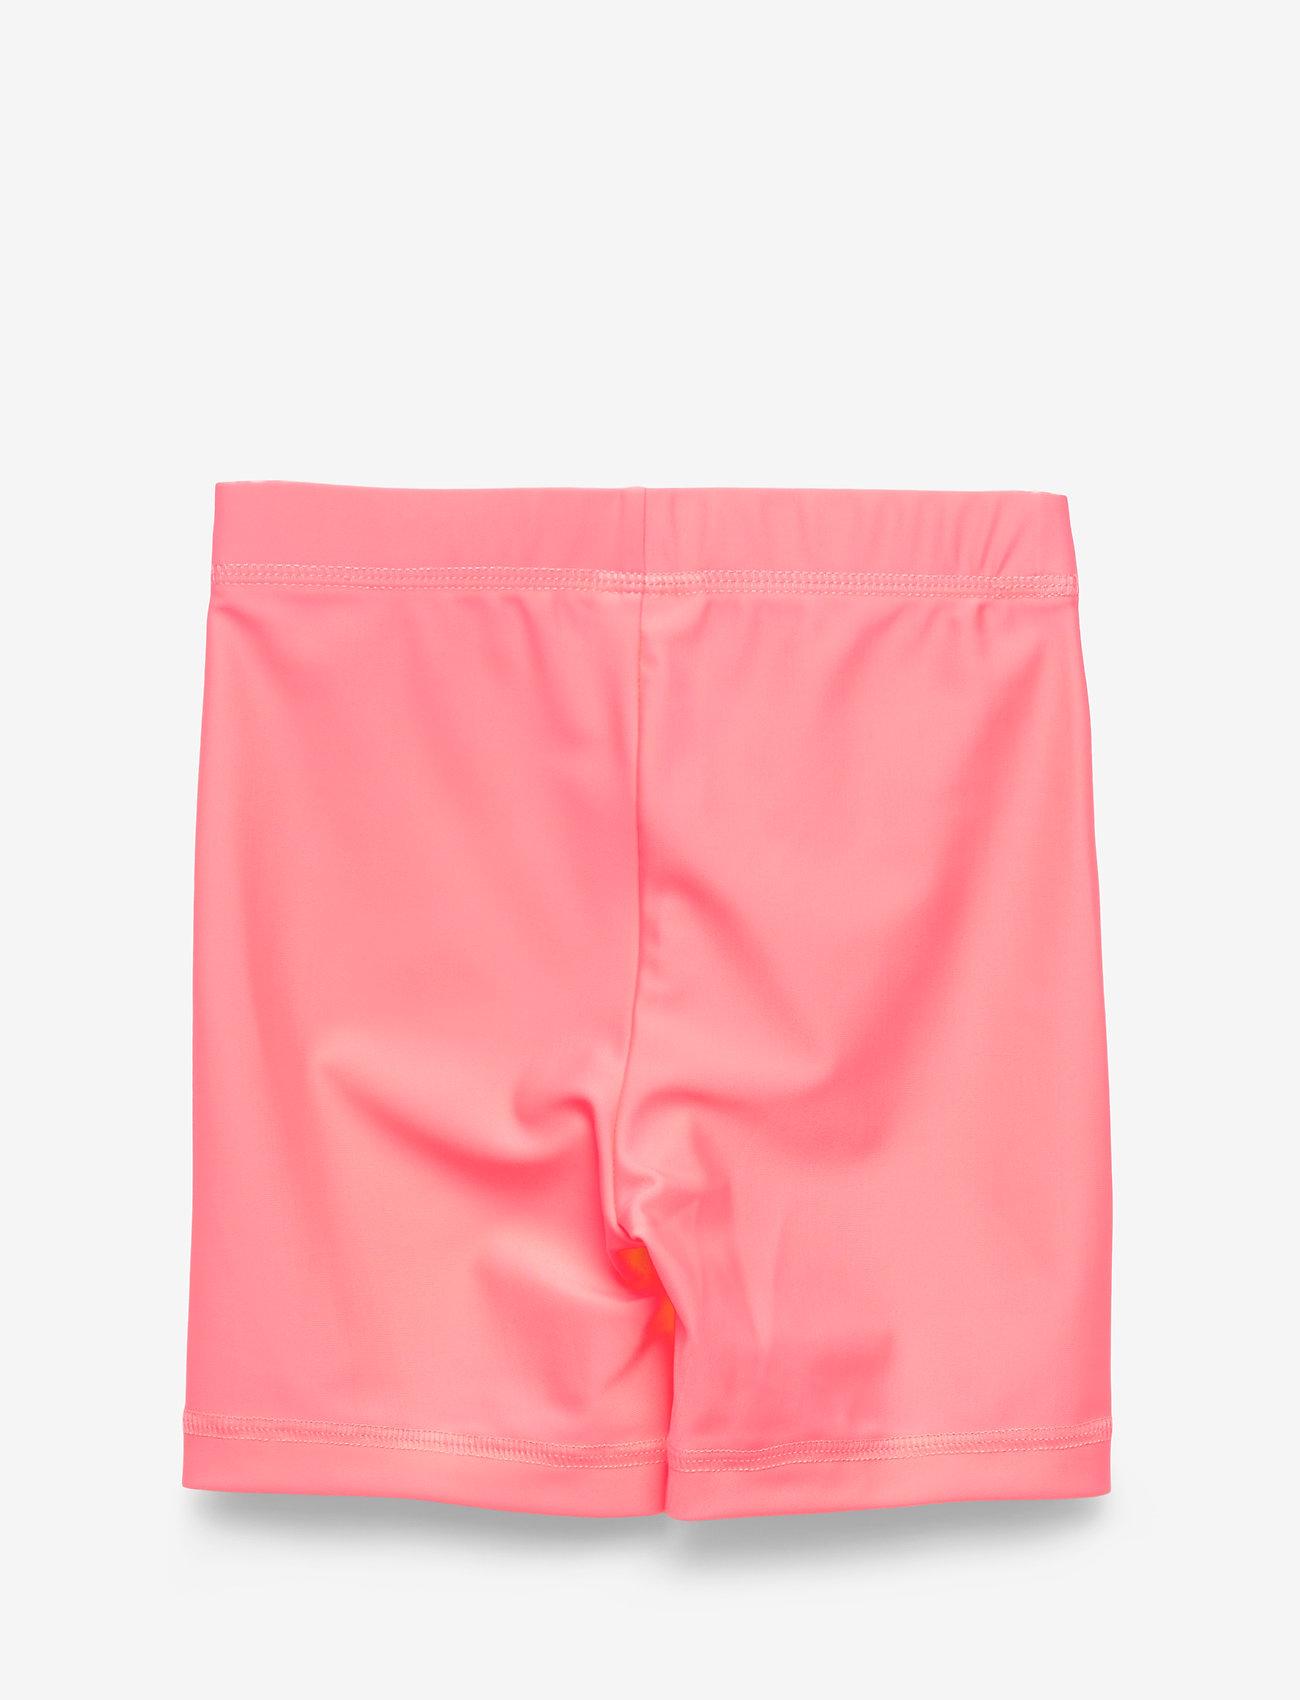 Polarn O. Pyret Swimwear Pants Short Upf School - Badkläder Yucca